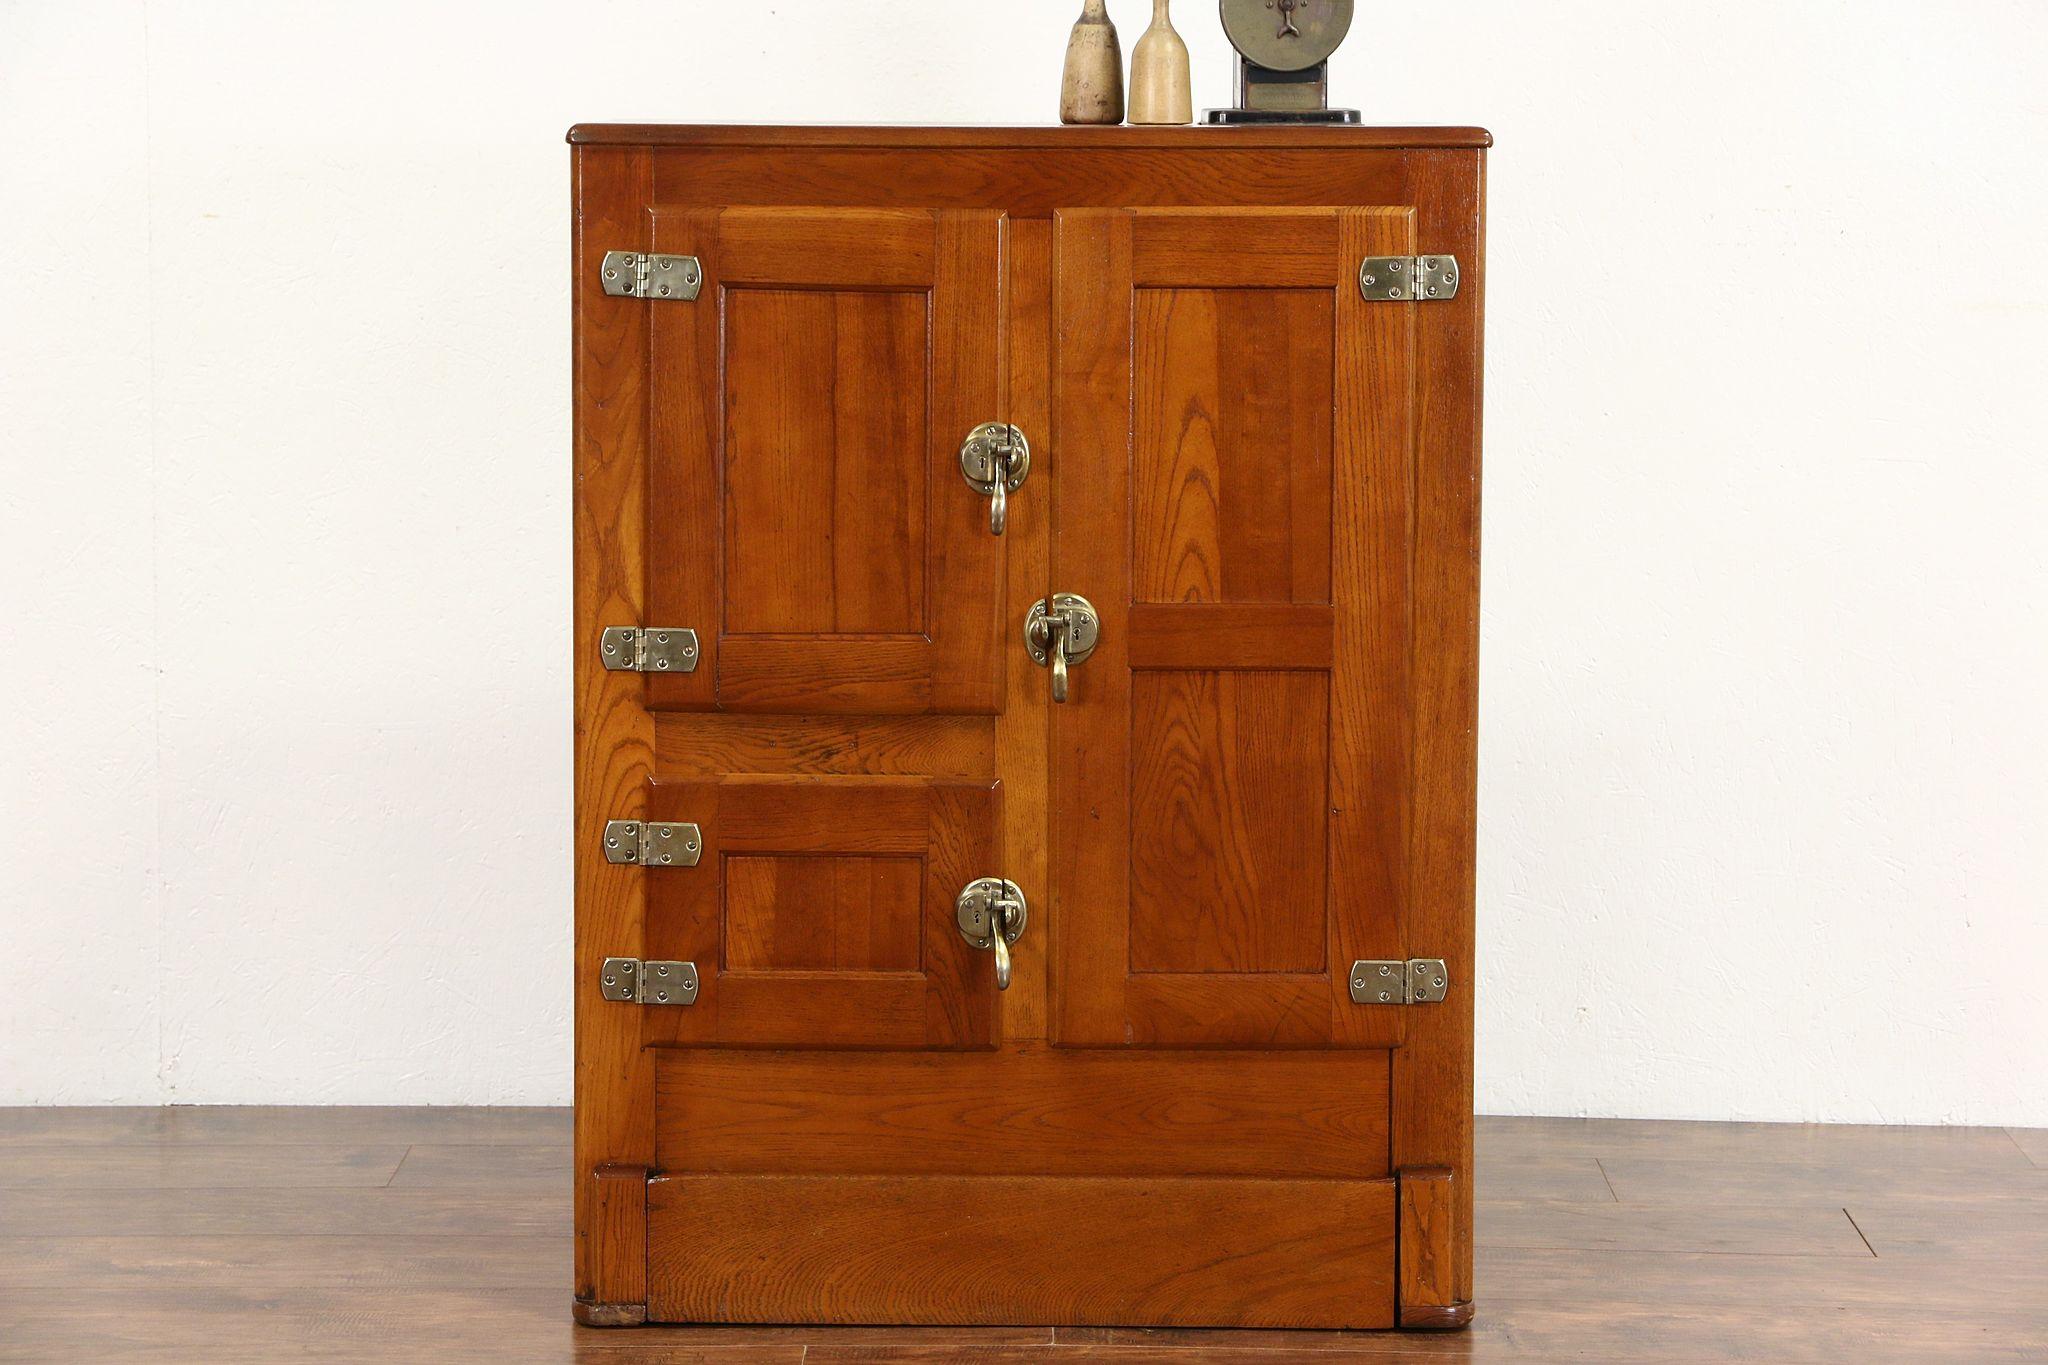 Beautiful Oak Ice Box, 1900 Antique Refrigerator, Original Brass Hardware